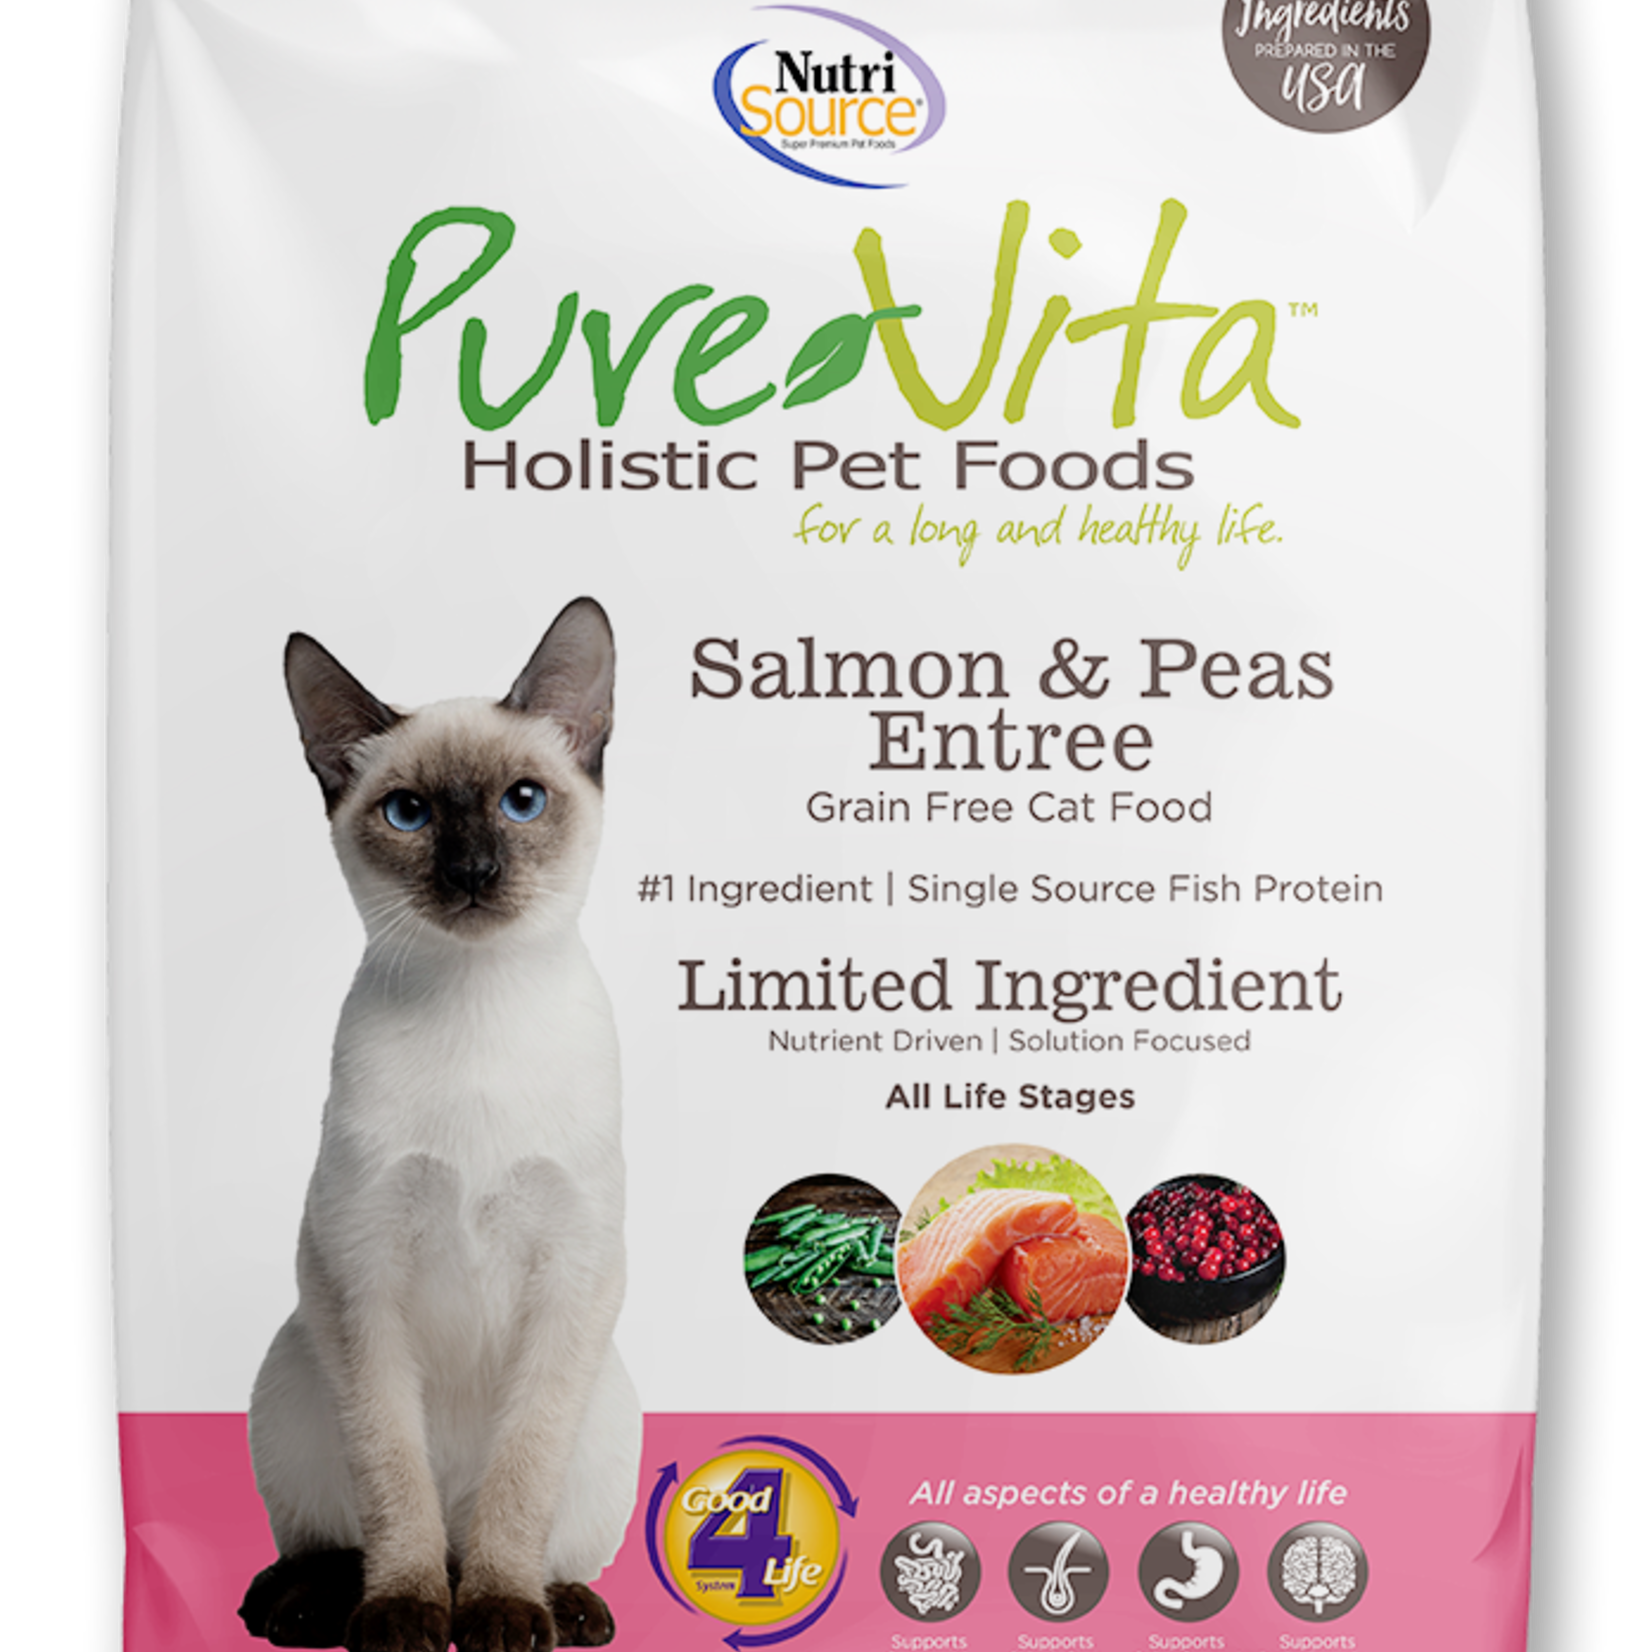 PureVita Pure Vita Cat GF Salmon 2.2#